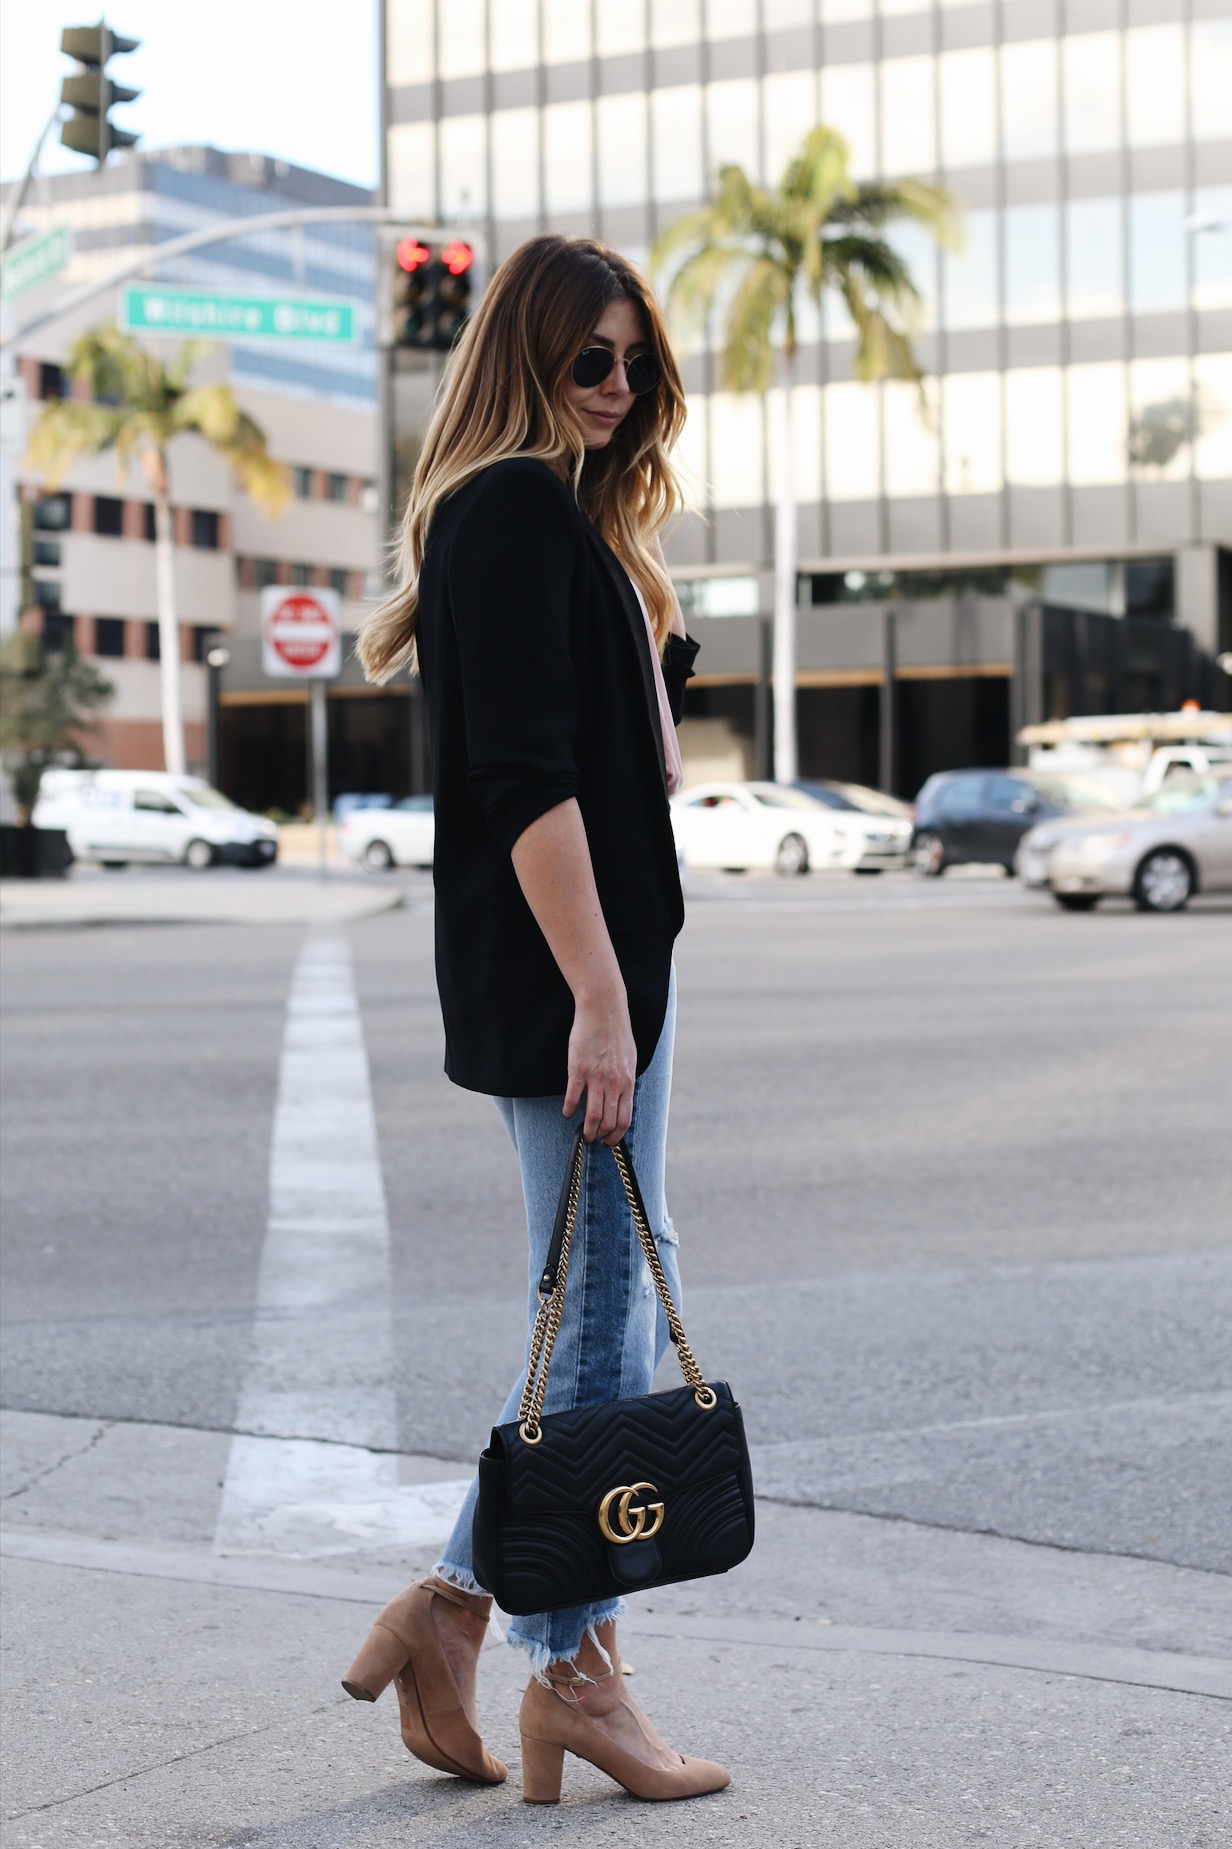 Emma Hill wears pink velvet came top, black blazer, ripped hem frayed jeans, Gucci Marmont bag, beige suede mid heels